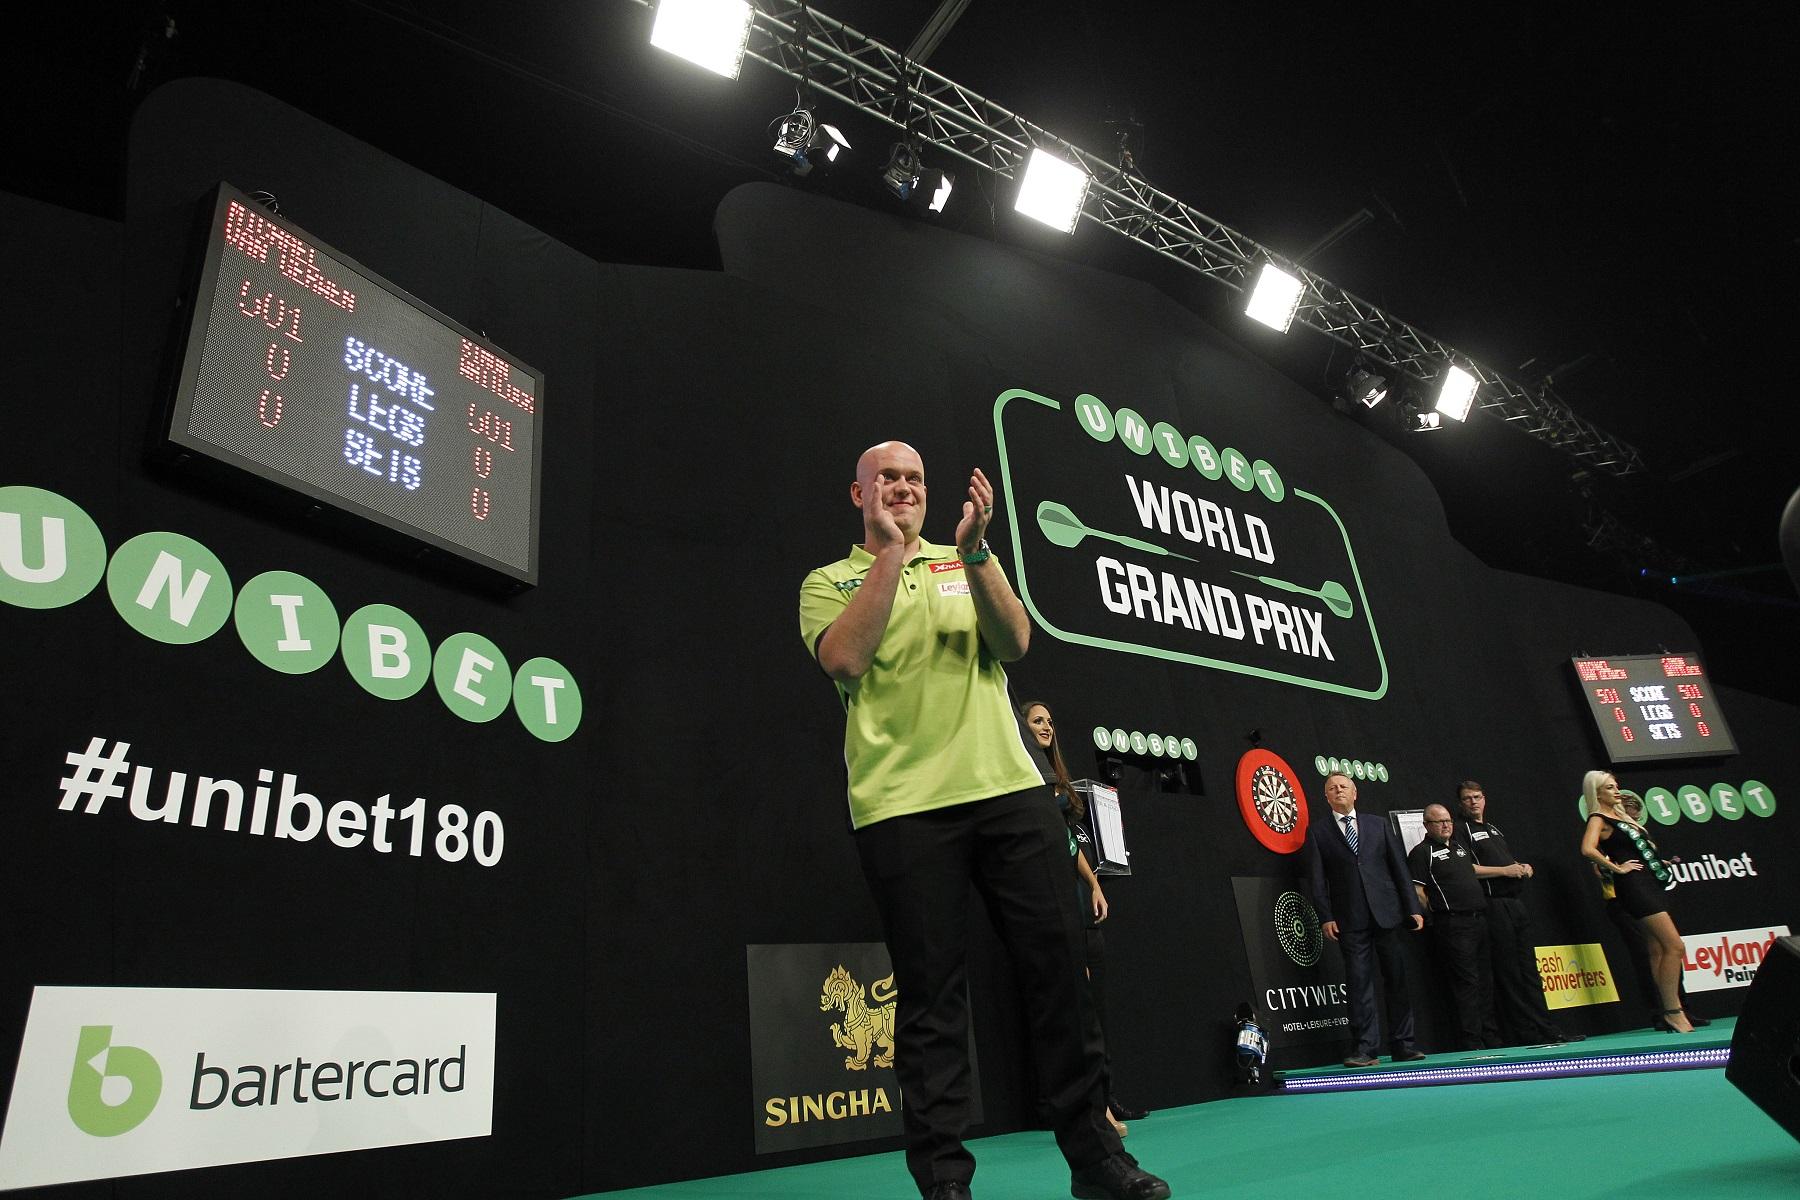 World grand prix darts 2021 betting calculator rc experts nicosia betting